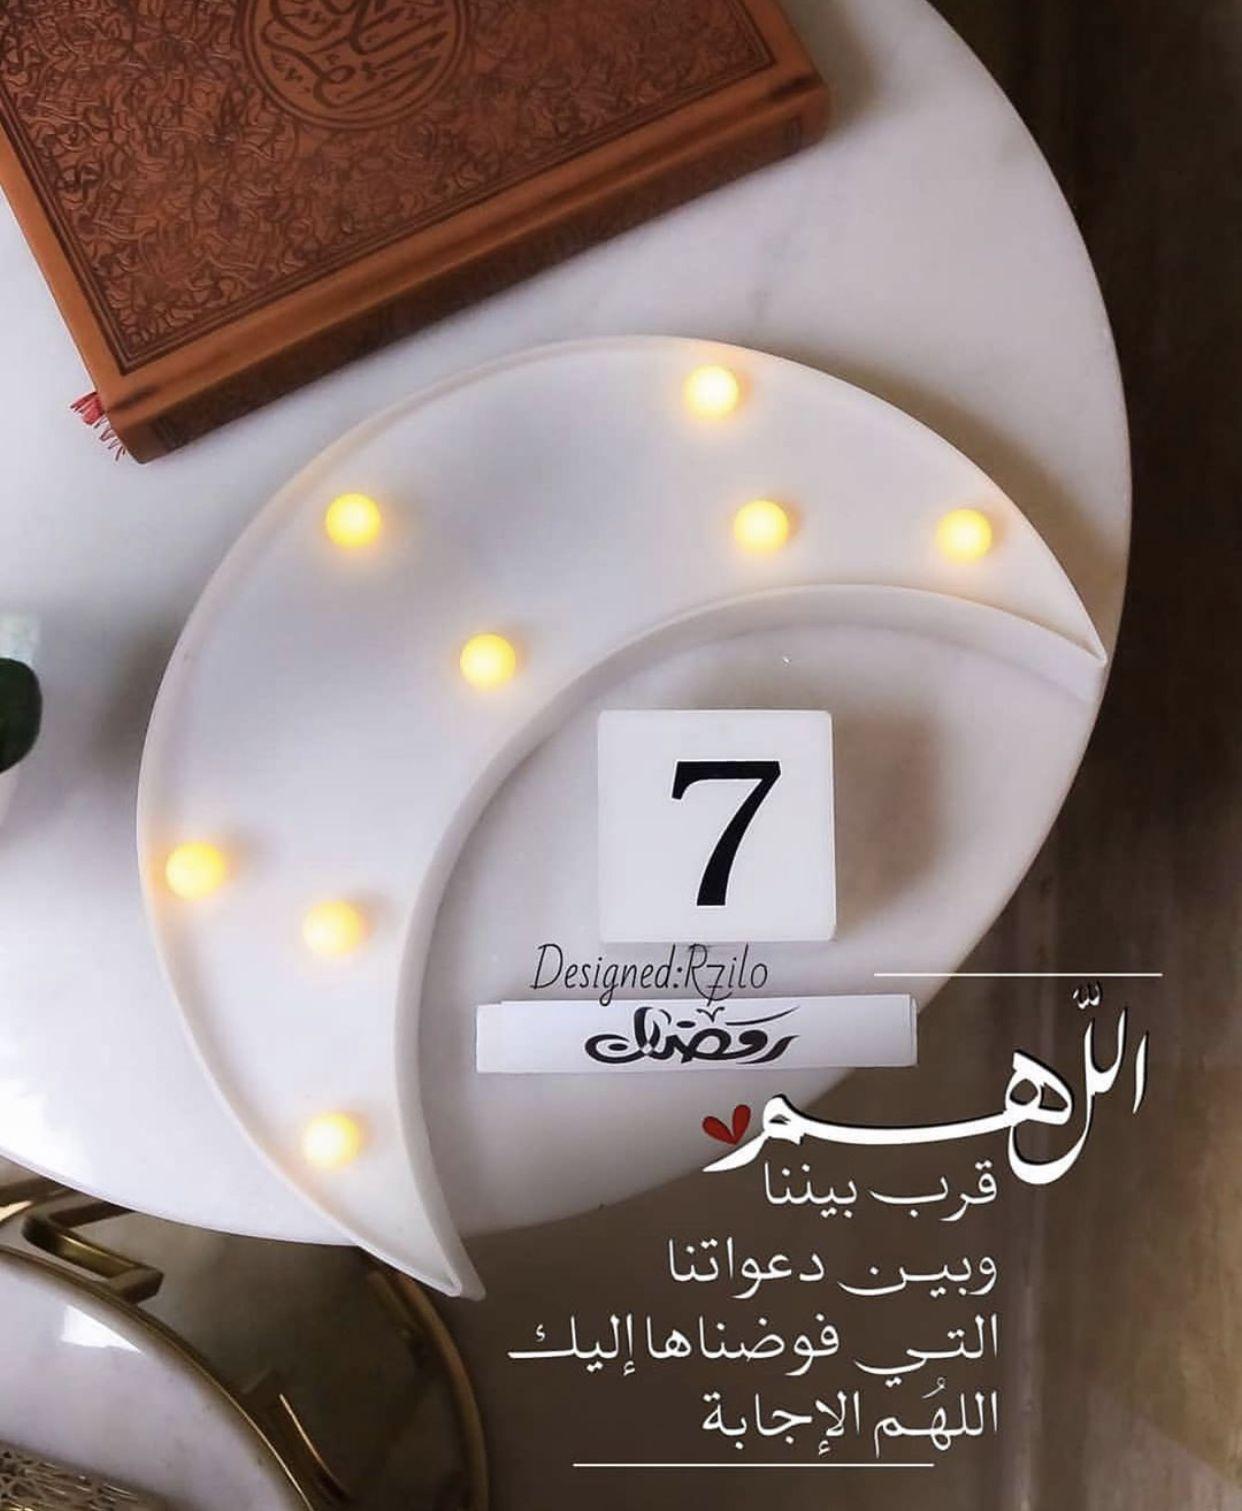 Pin By Zino On علاج لكل شيء Ramadan Day Dark Wallpaper Iphone Ramadan